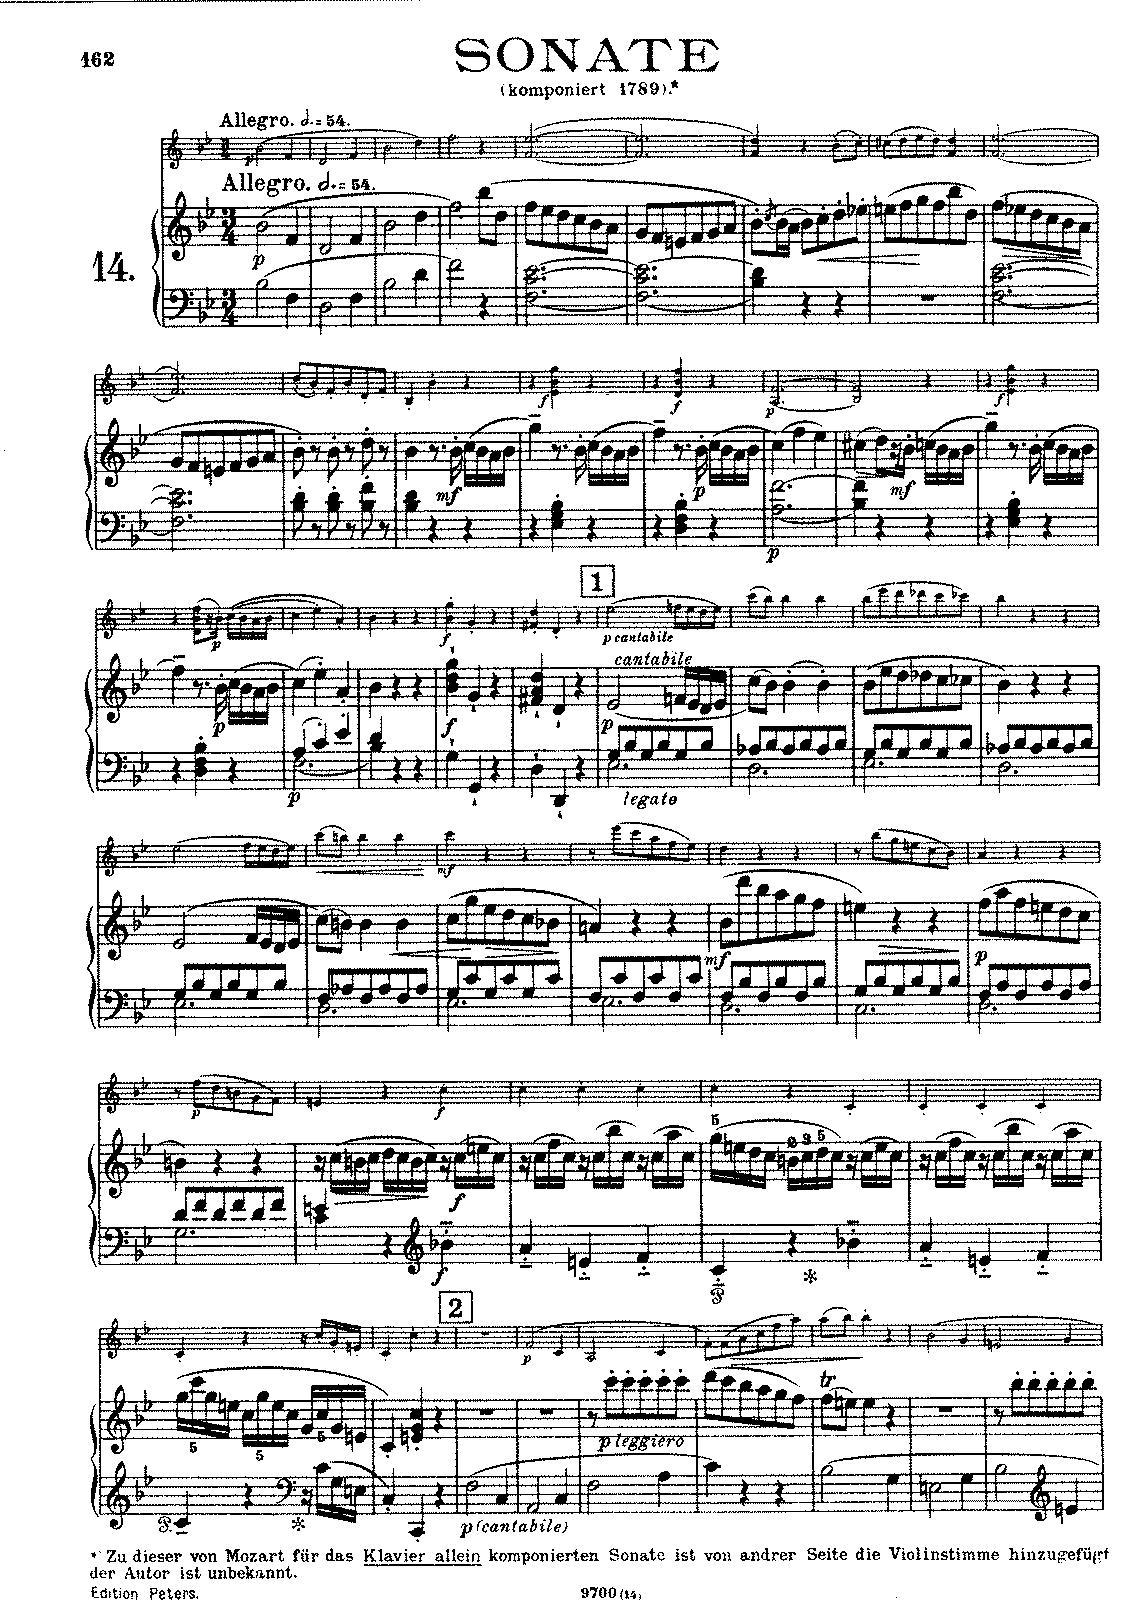 mozart s piano sonata in b flat major k 570 Uchida's award-winning recordings of mozart's piano sonatas:  piano sonata no17 in b flat major, k570 - 3 allegretto 0:00 related albums.